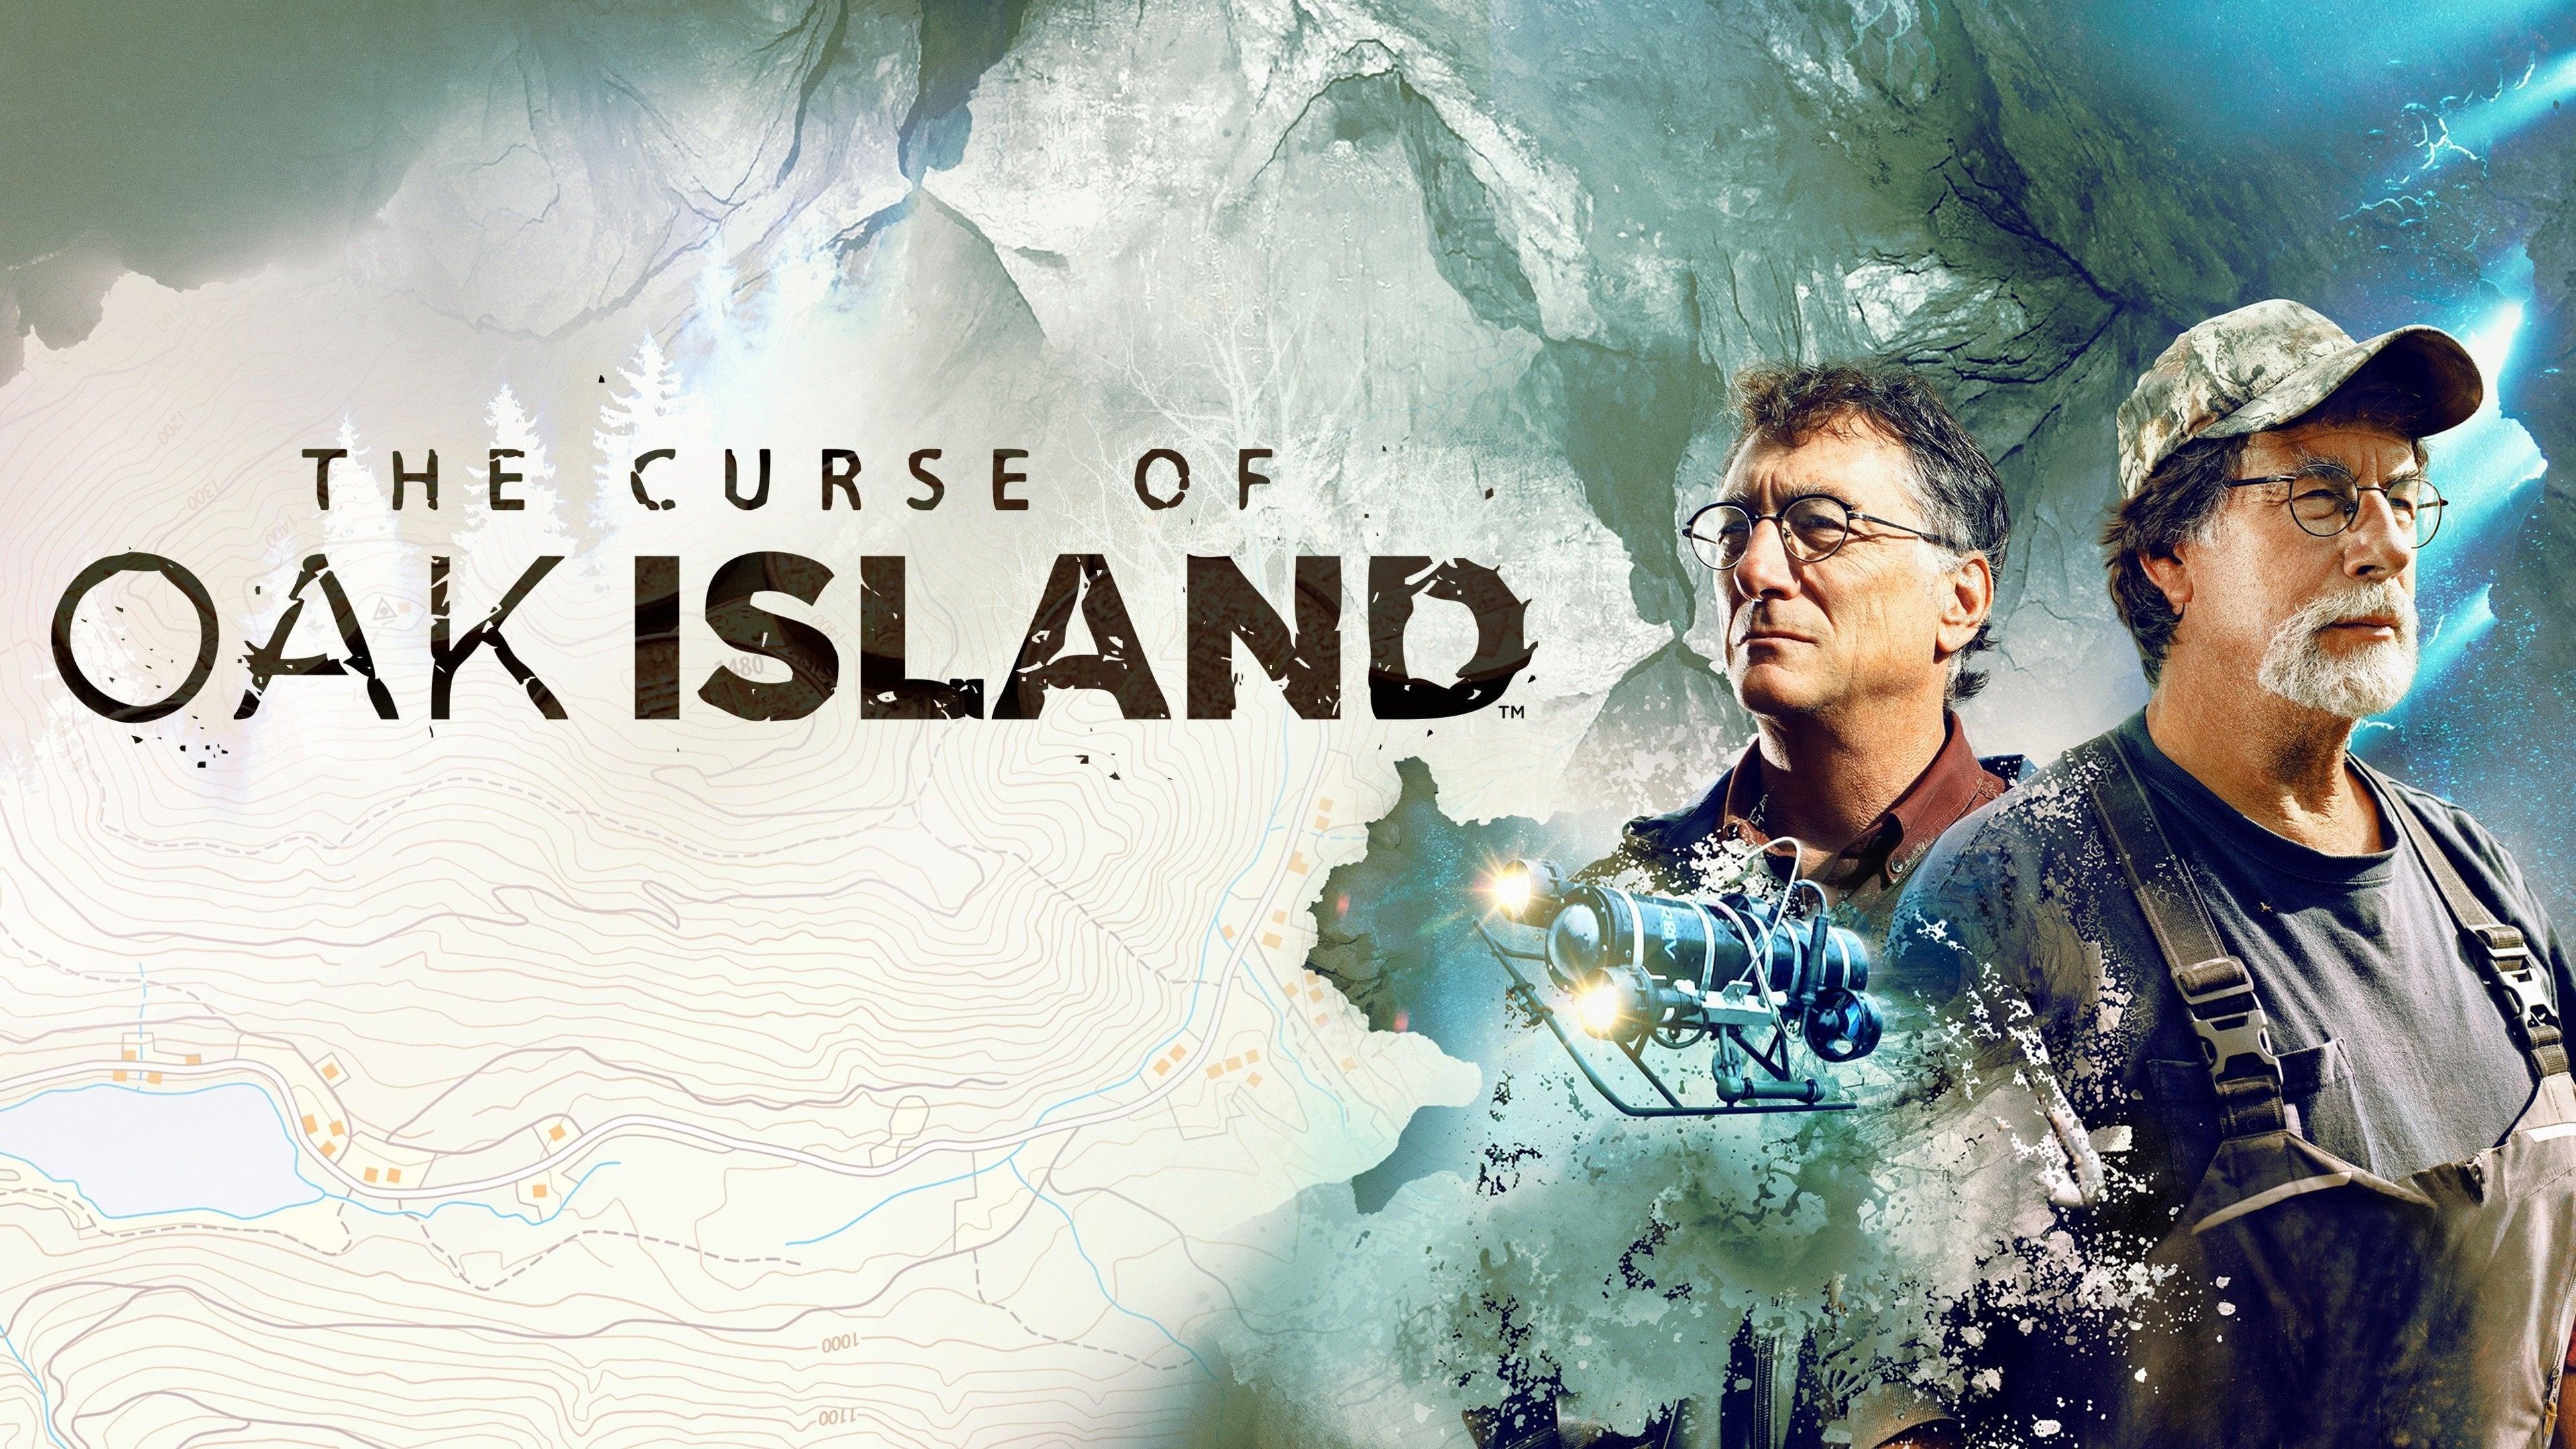 The Curse of Oak Island - Season 2